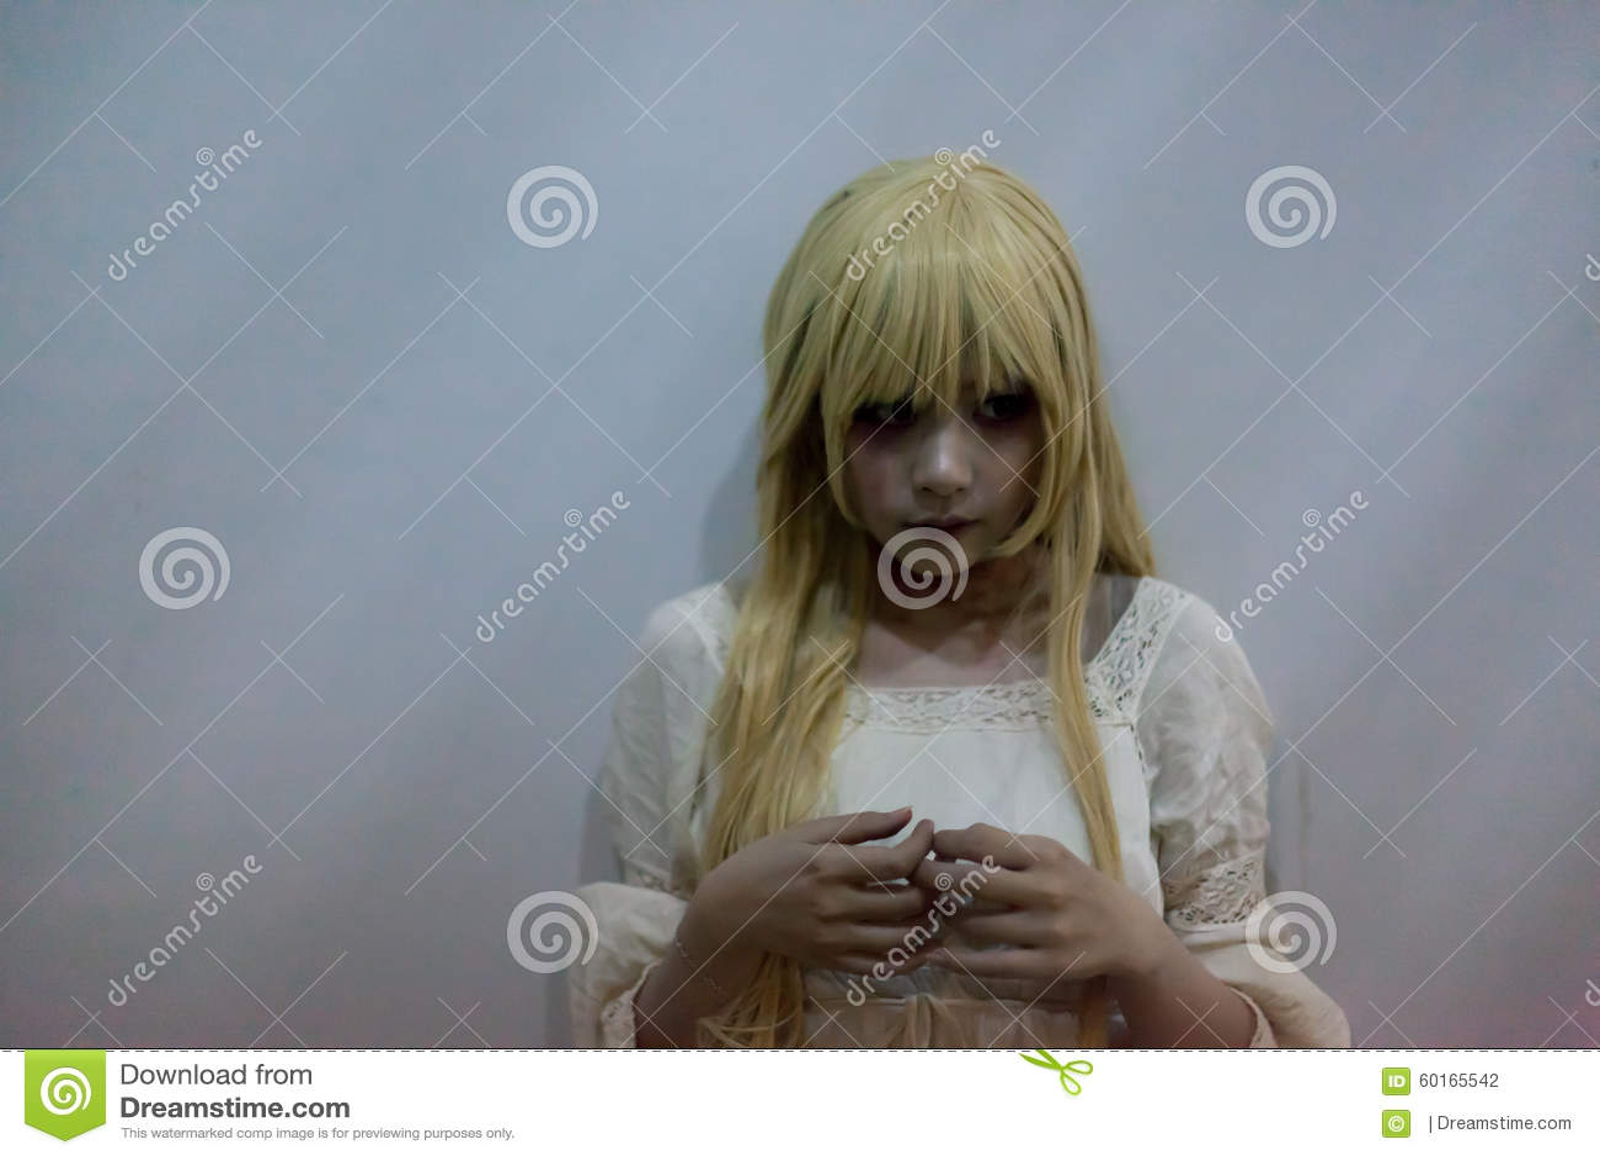 Asian girl halloween